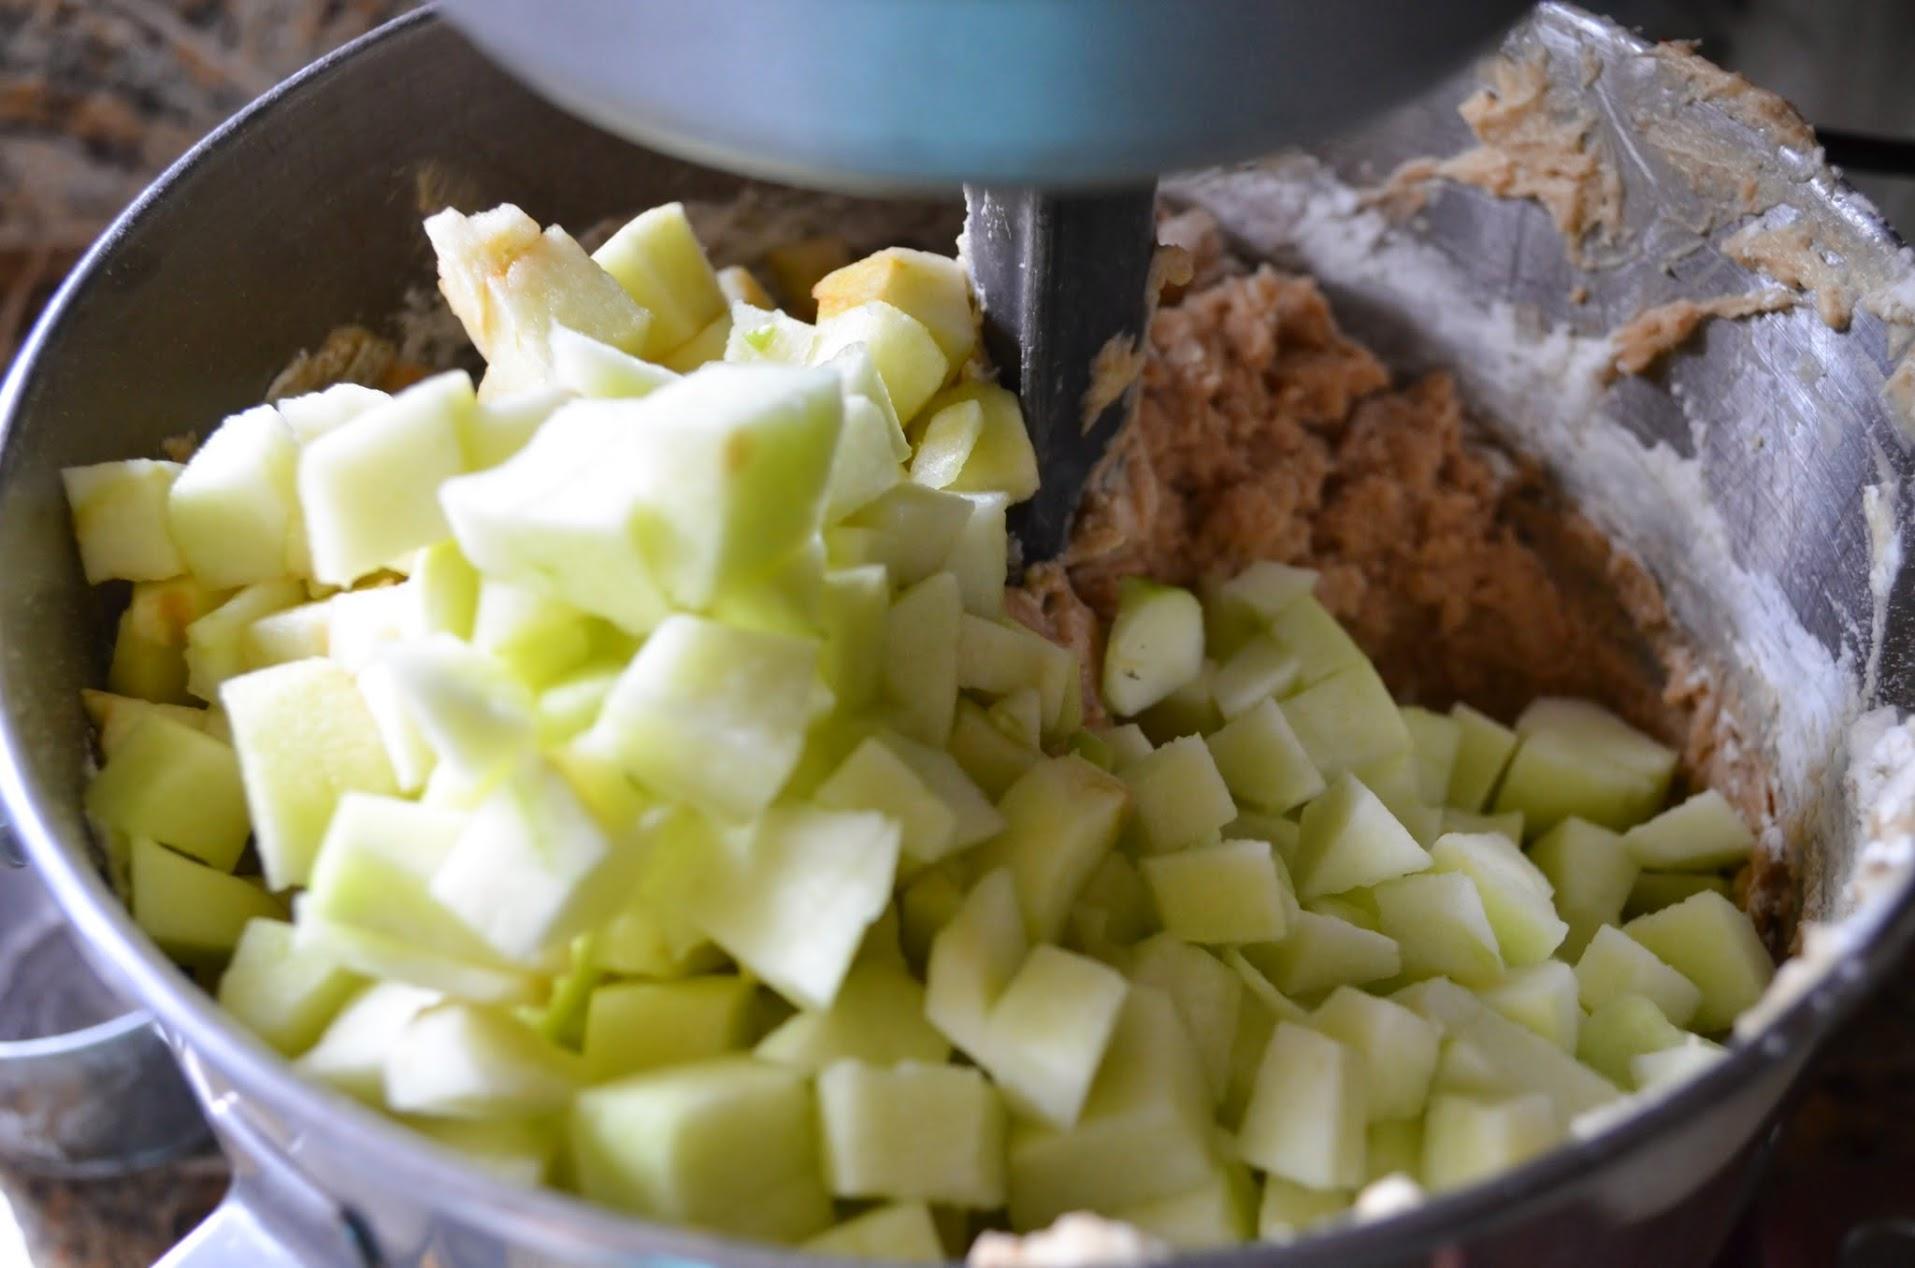 Caramel-Apple-Cake-Granny-Smith-Apple.jpg